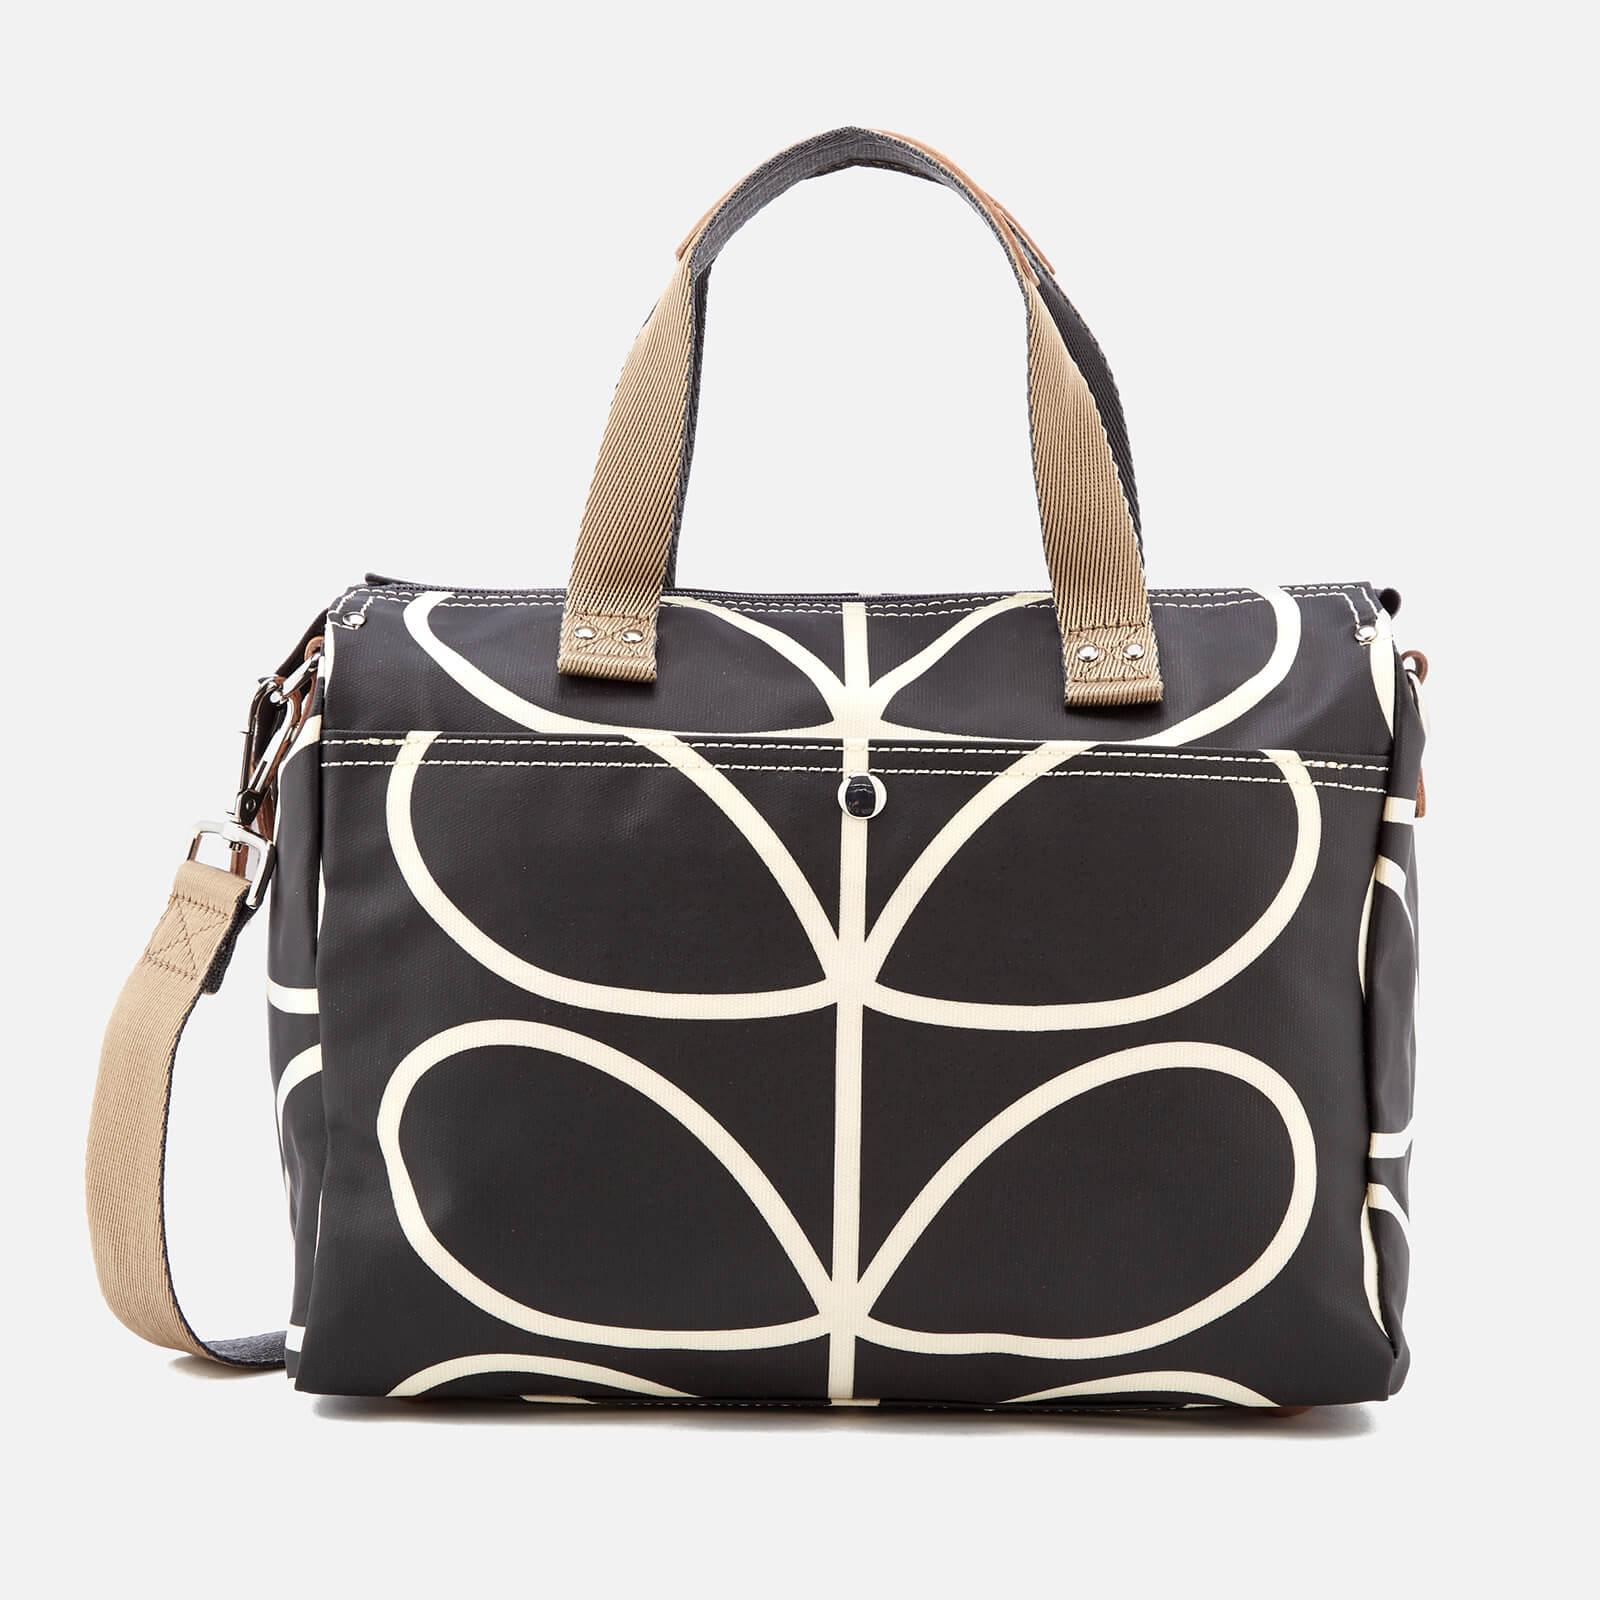 bb313f512cb59 Orla Kiely Women's Giant Linear Stem Messenger Bag - Liquorice Womens  Accessories | TheHut.com